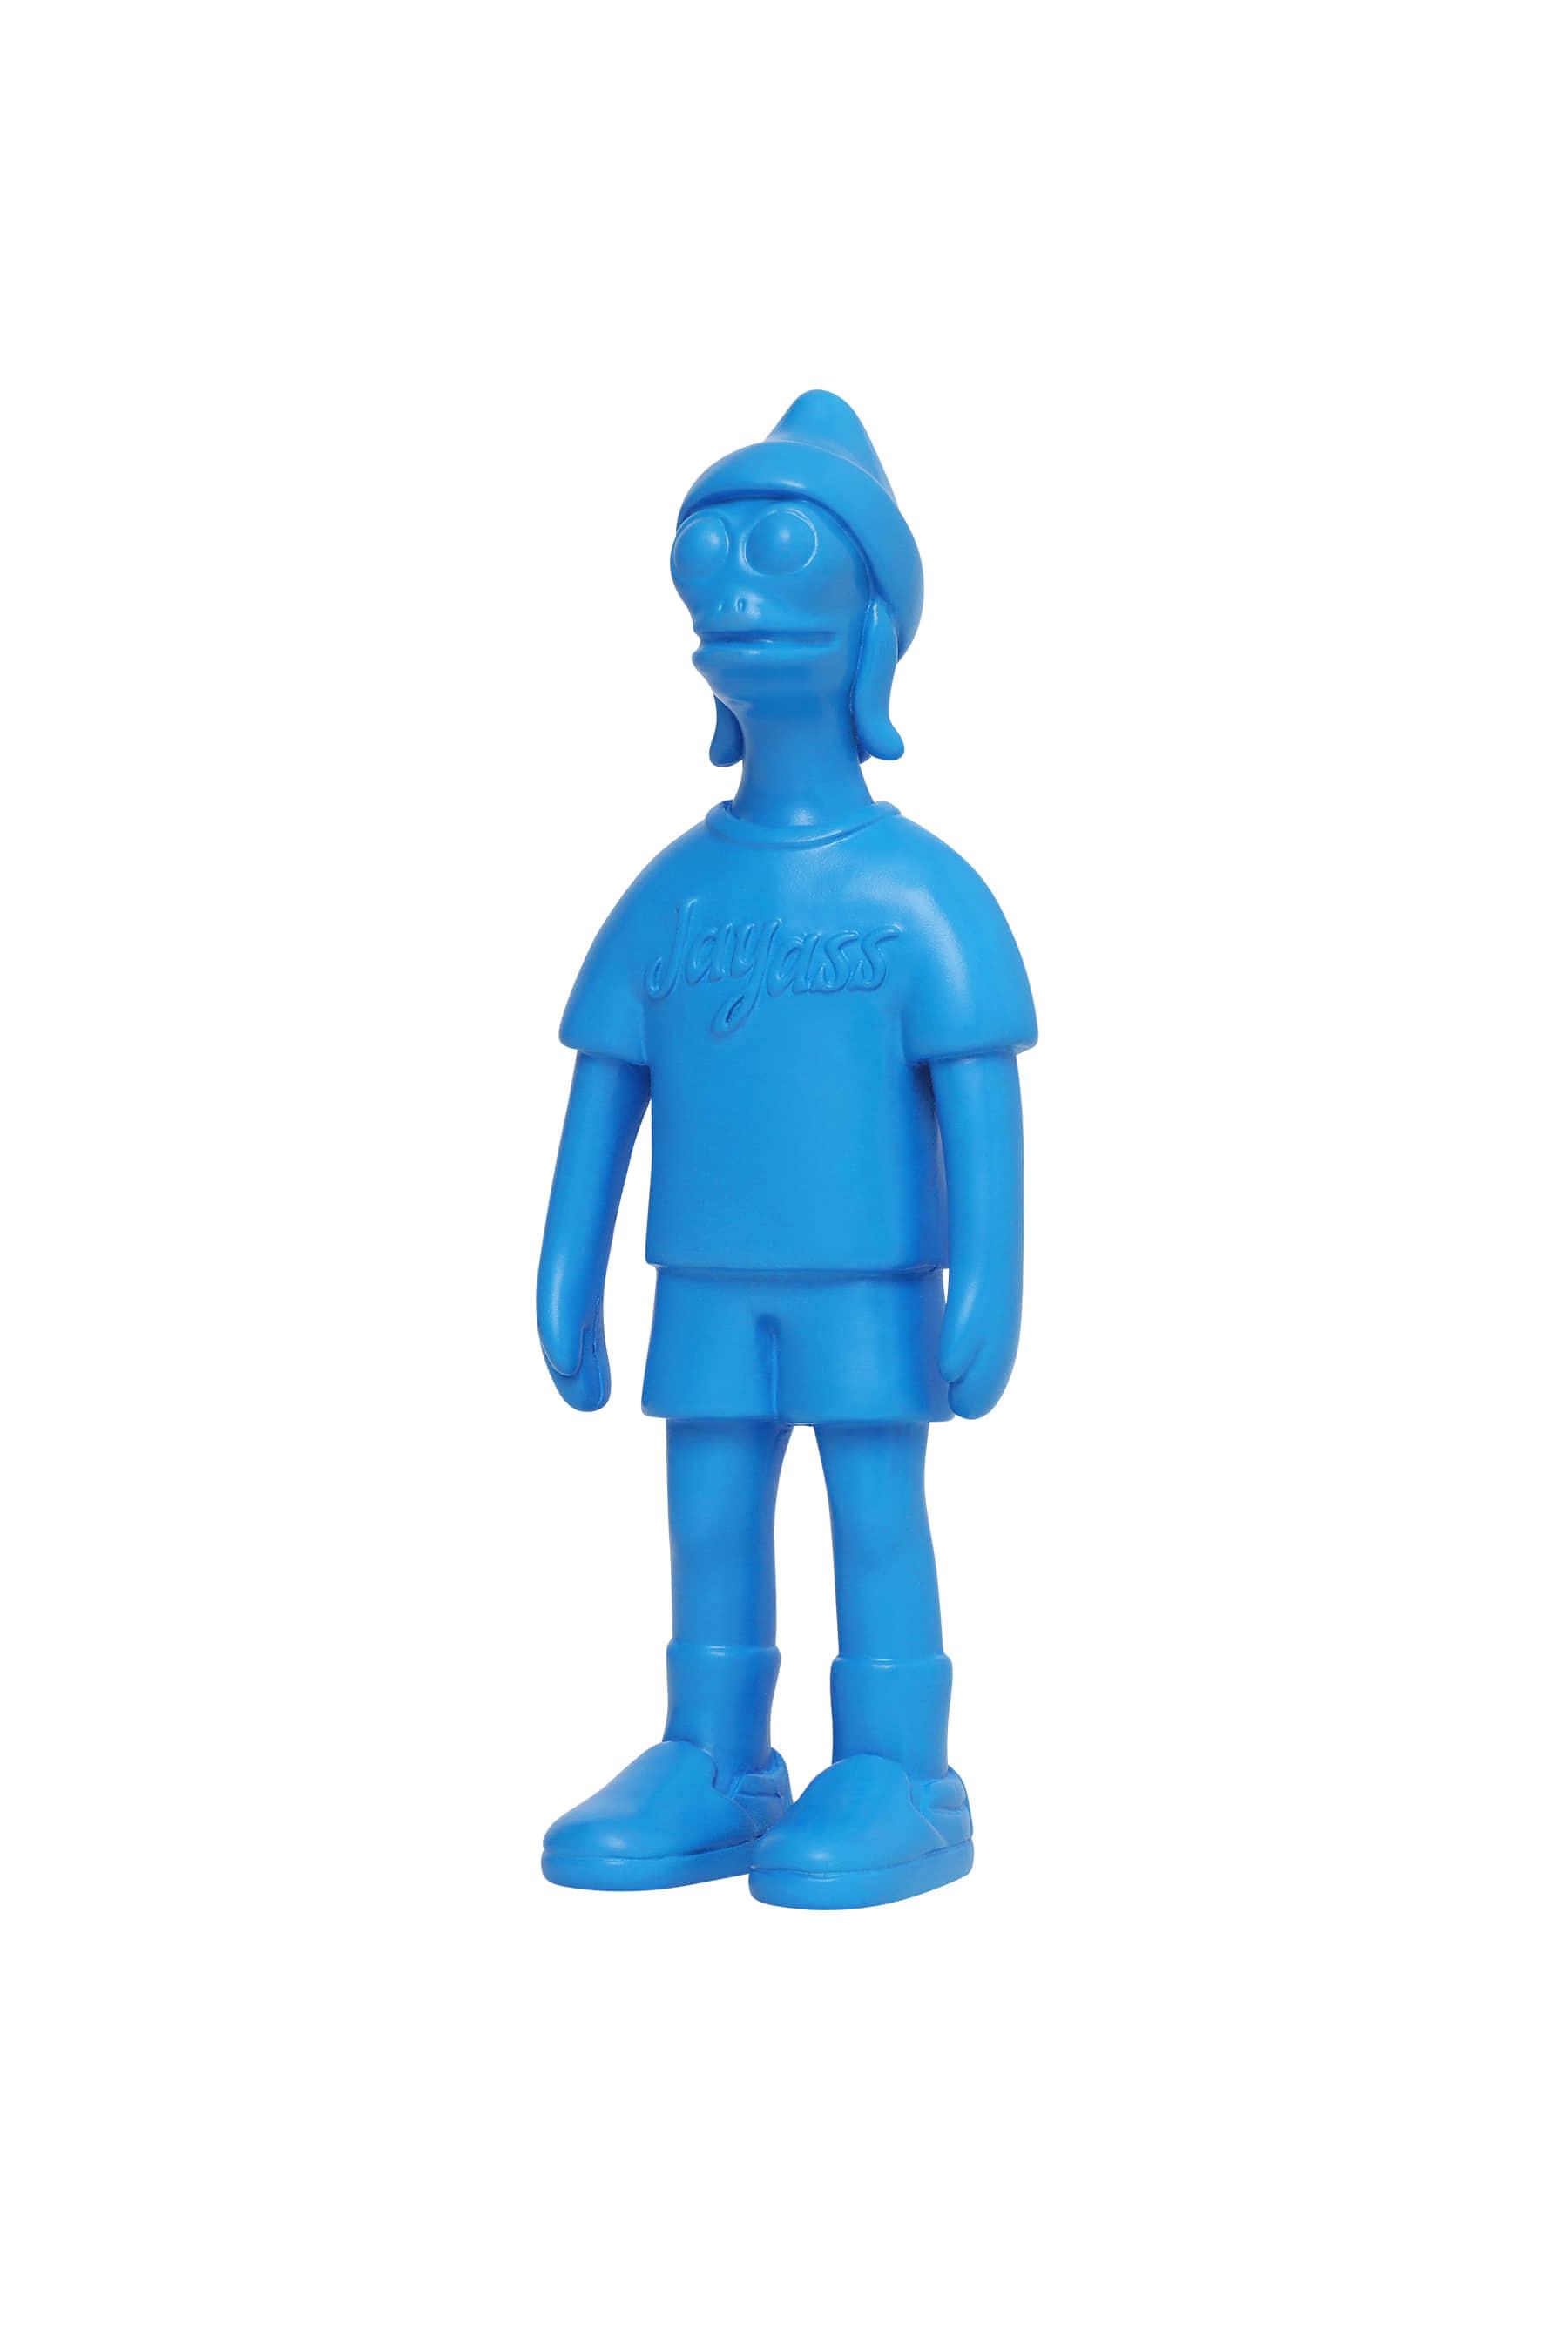 JAYASSEYESEE Figure Blue